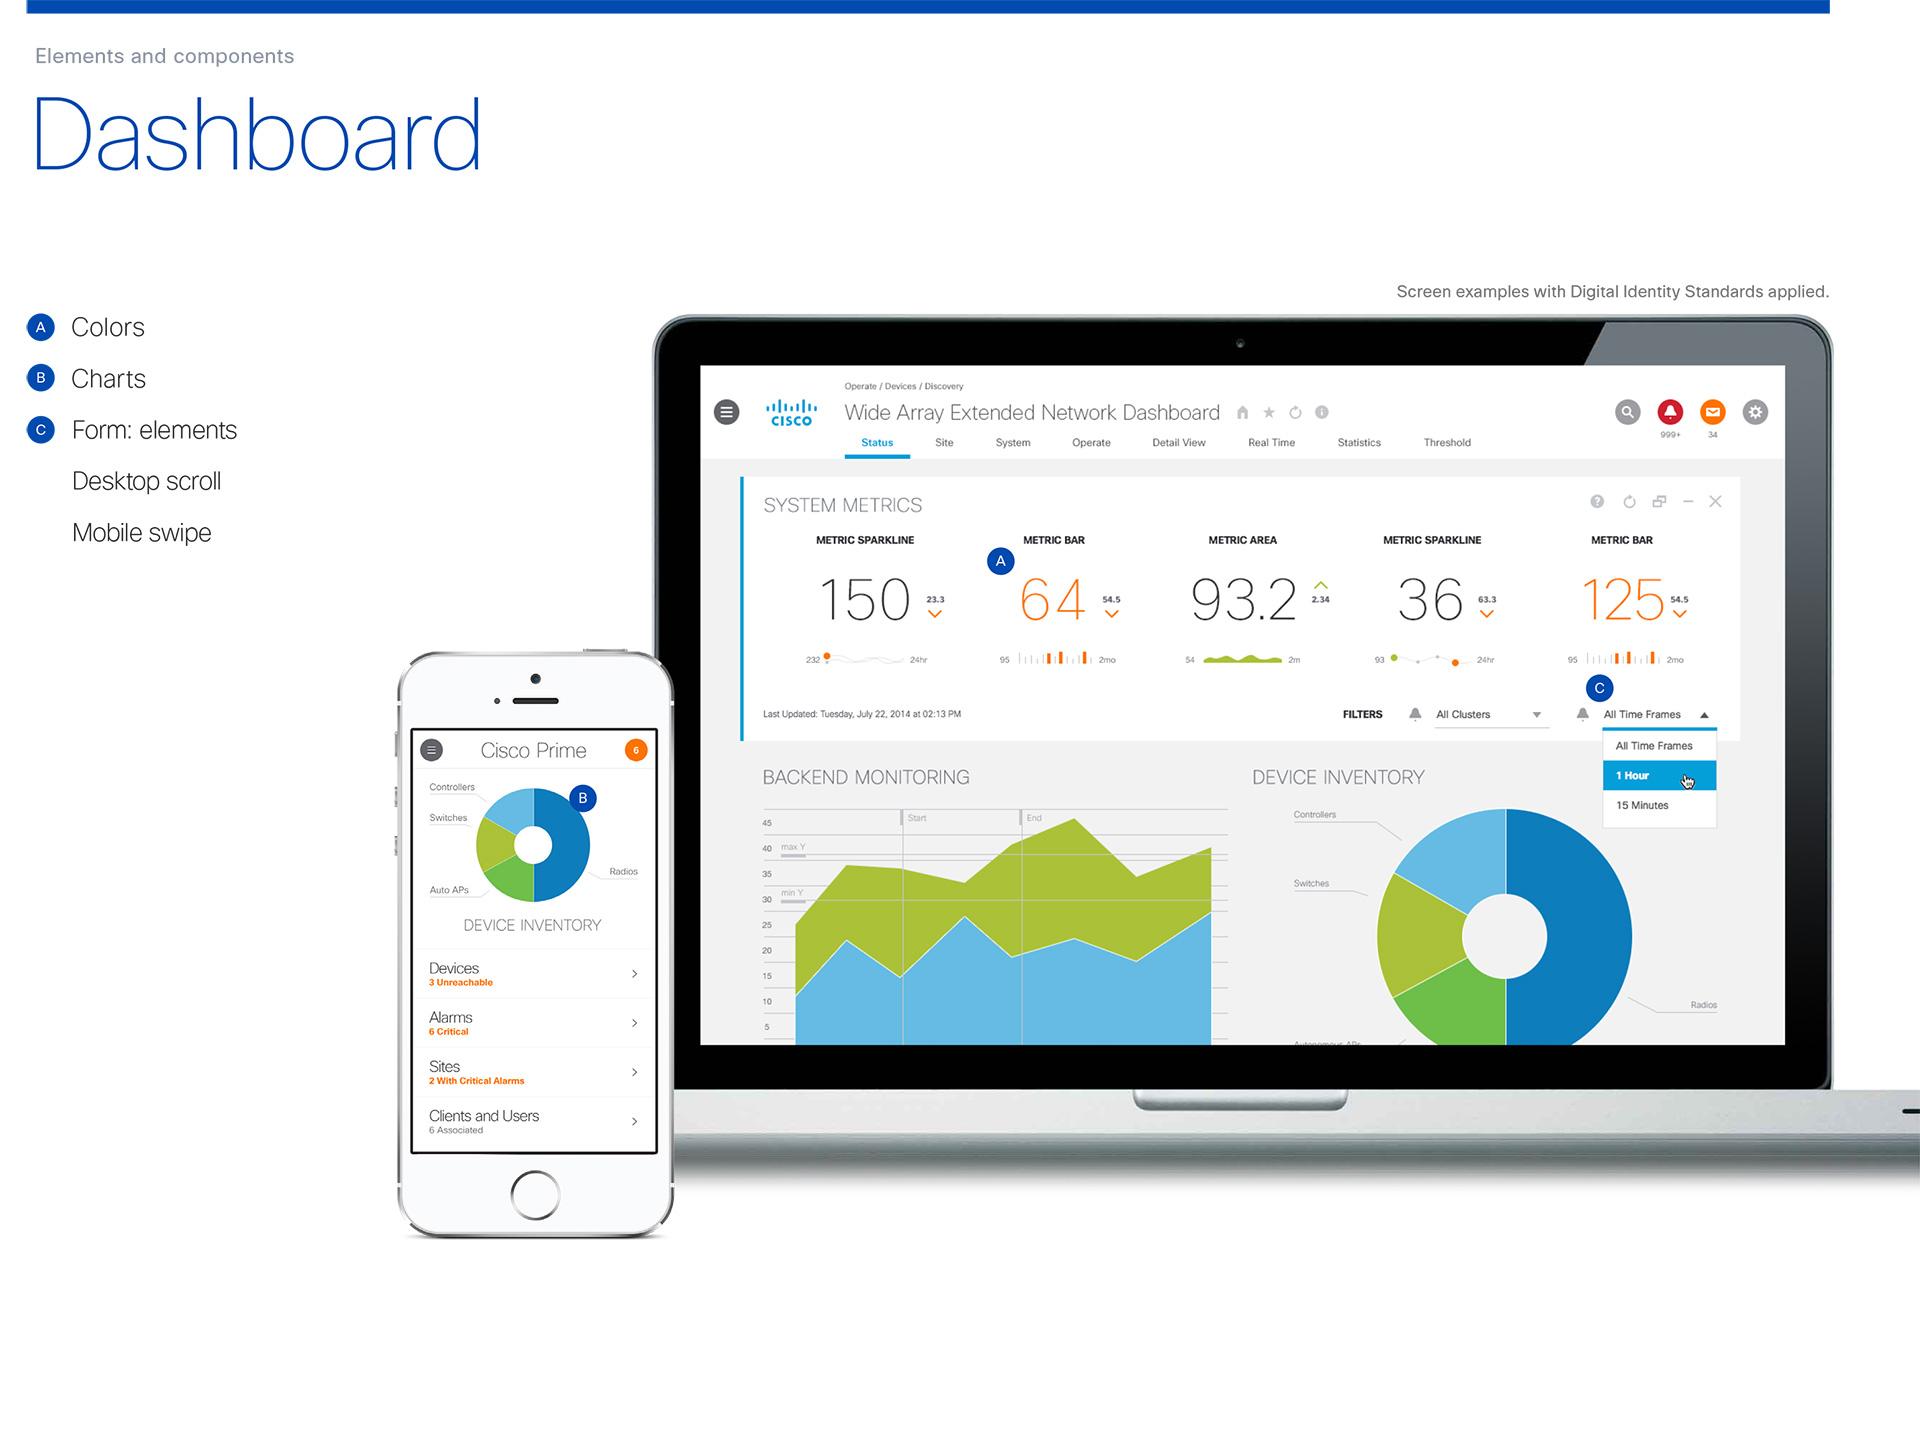 Cisco Dashboard UI Design